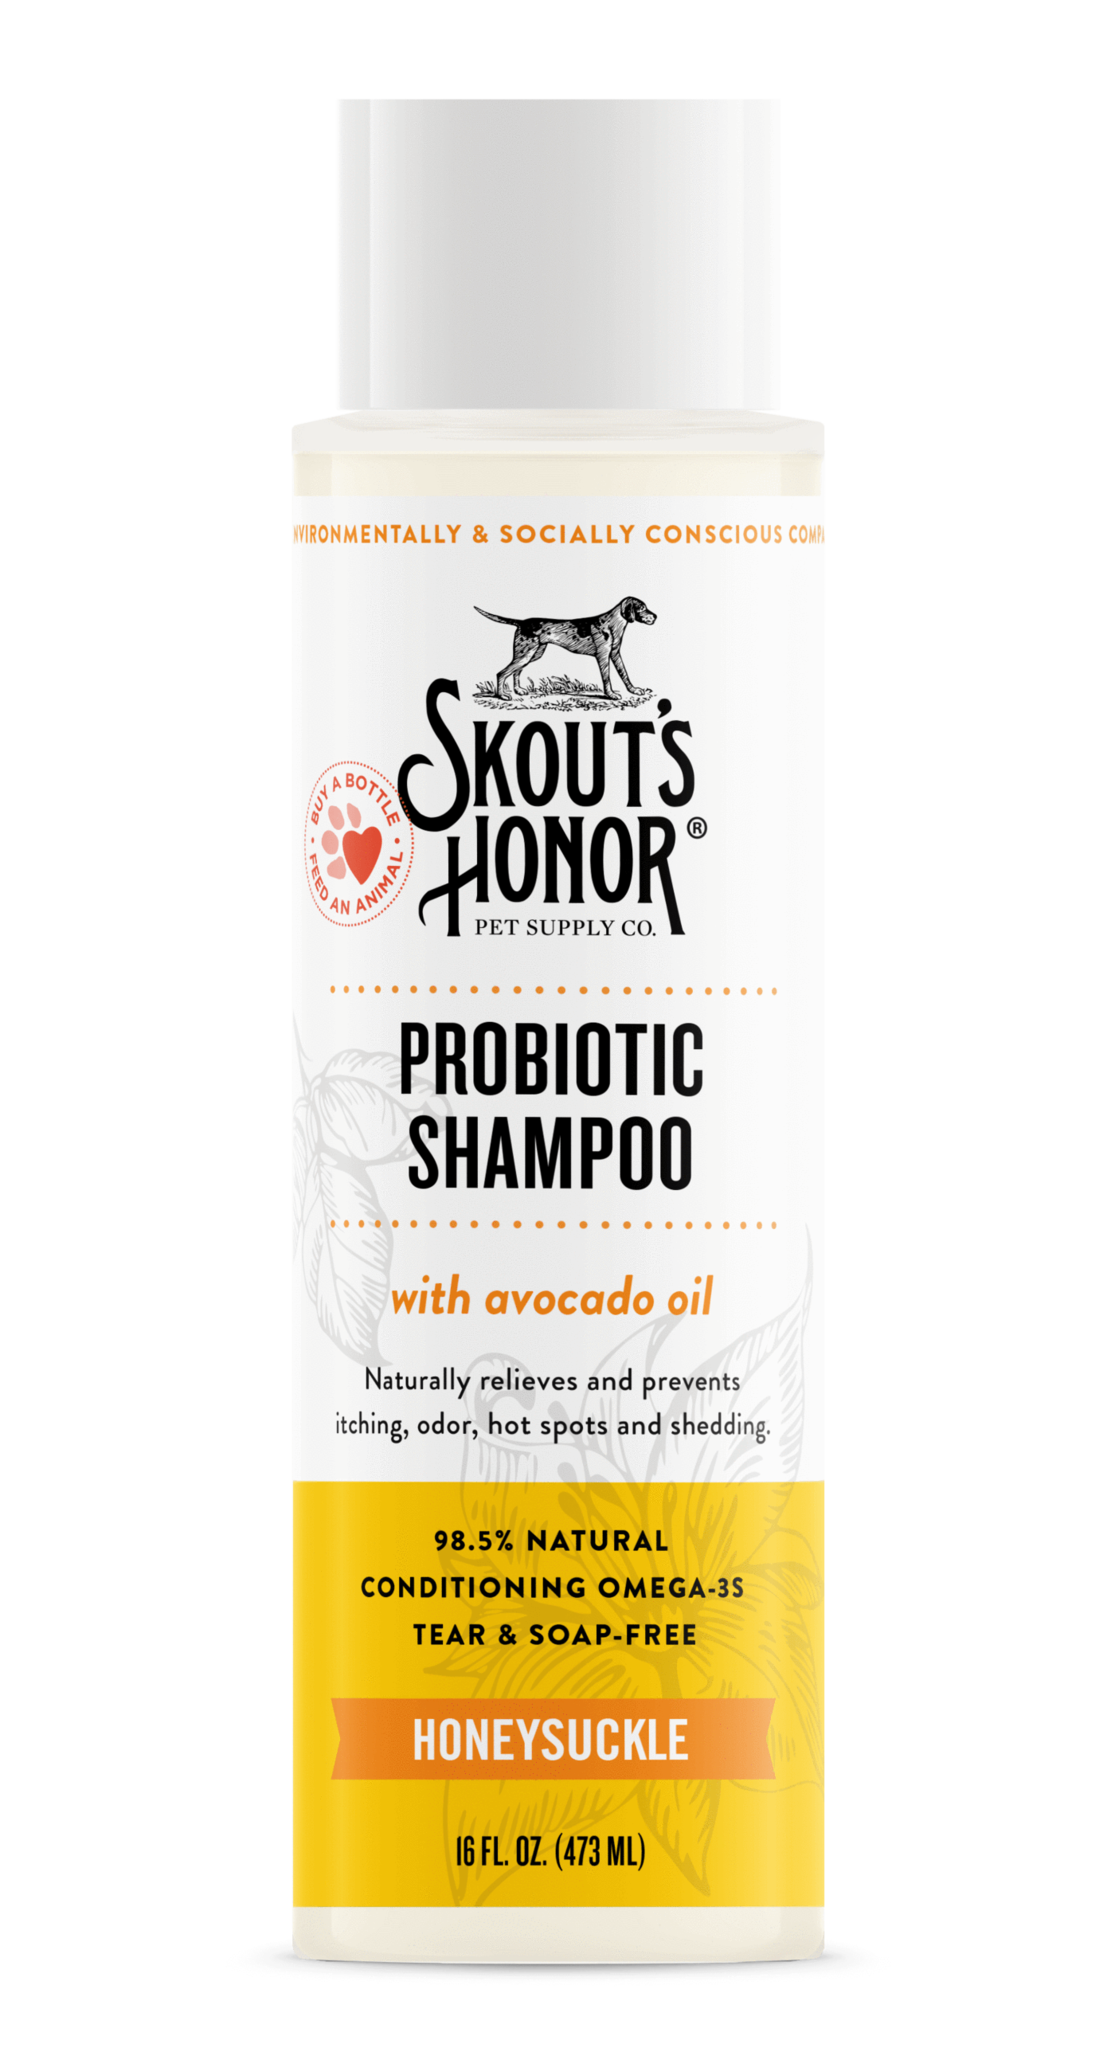 Skout's Honor Skout's Honor Probiotic Shampoo - Honeysuckle 16oz